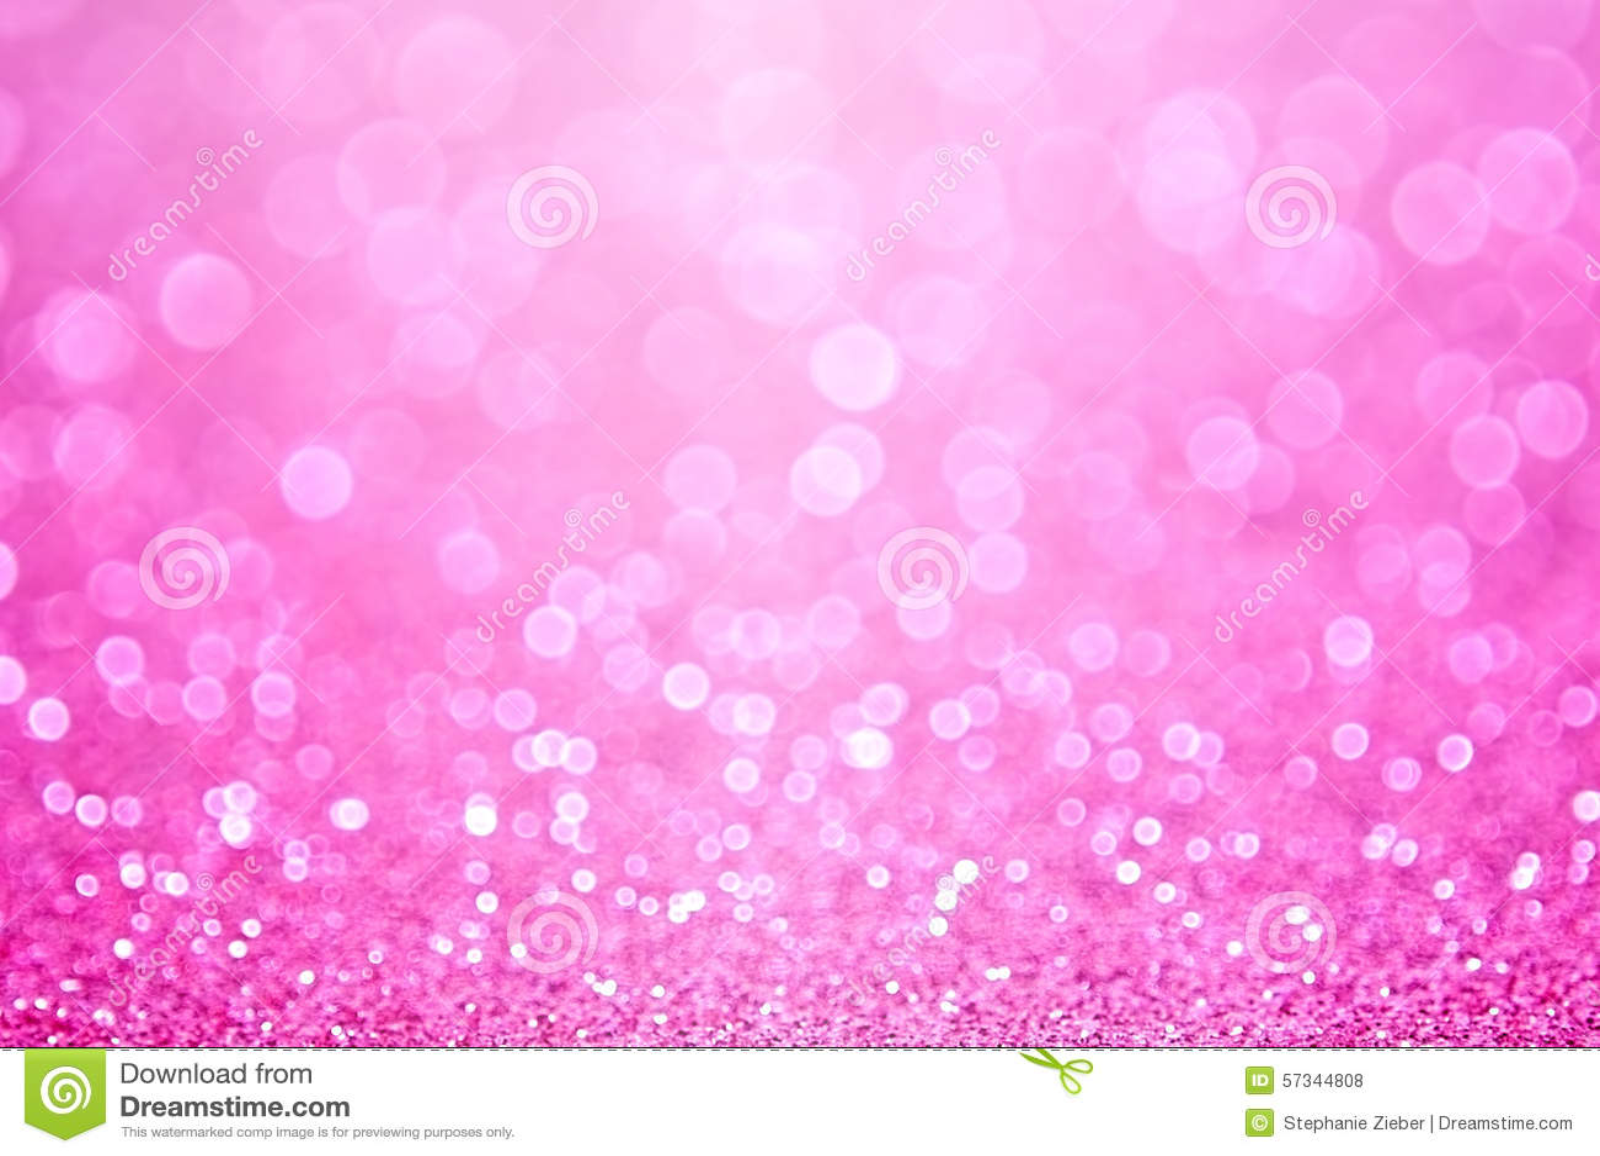 Cute Wedding Cartoon Wallpaper Pink Princess Baby Girl Birthday Background Stock Photo